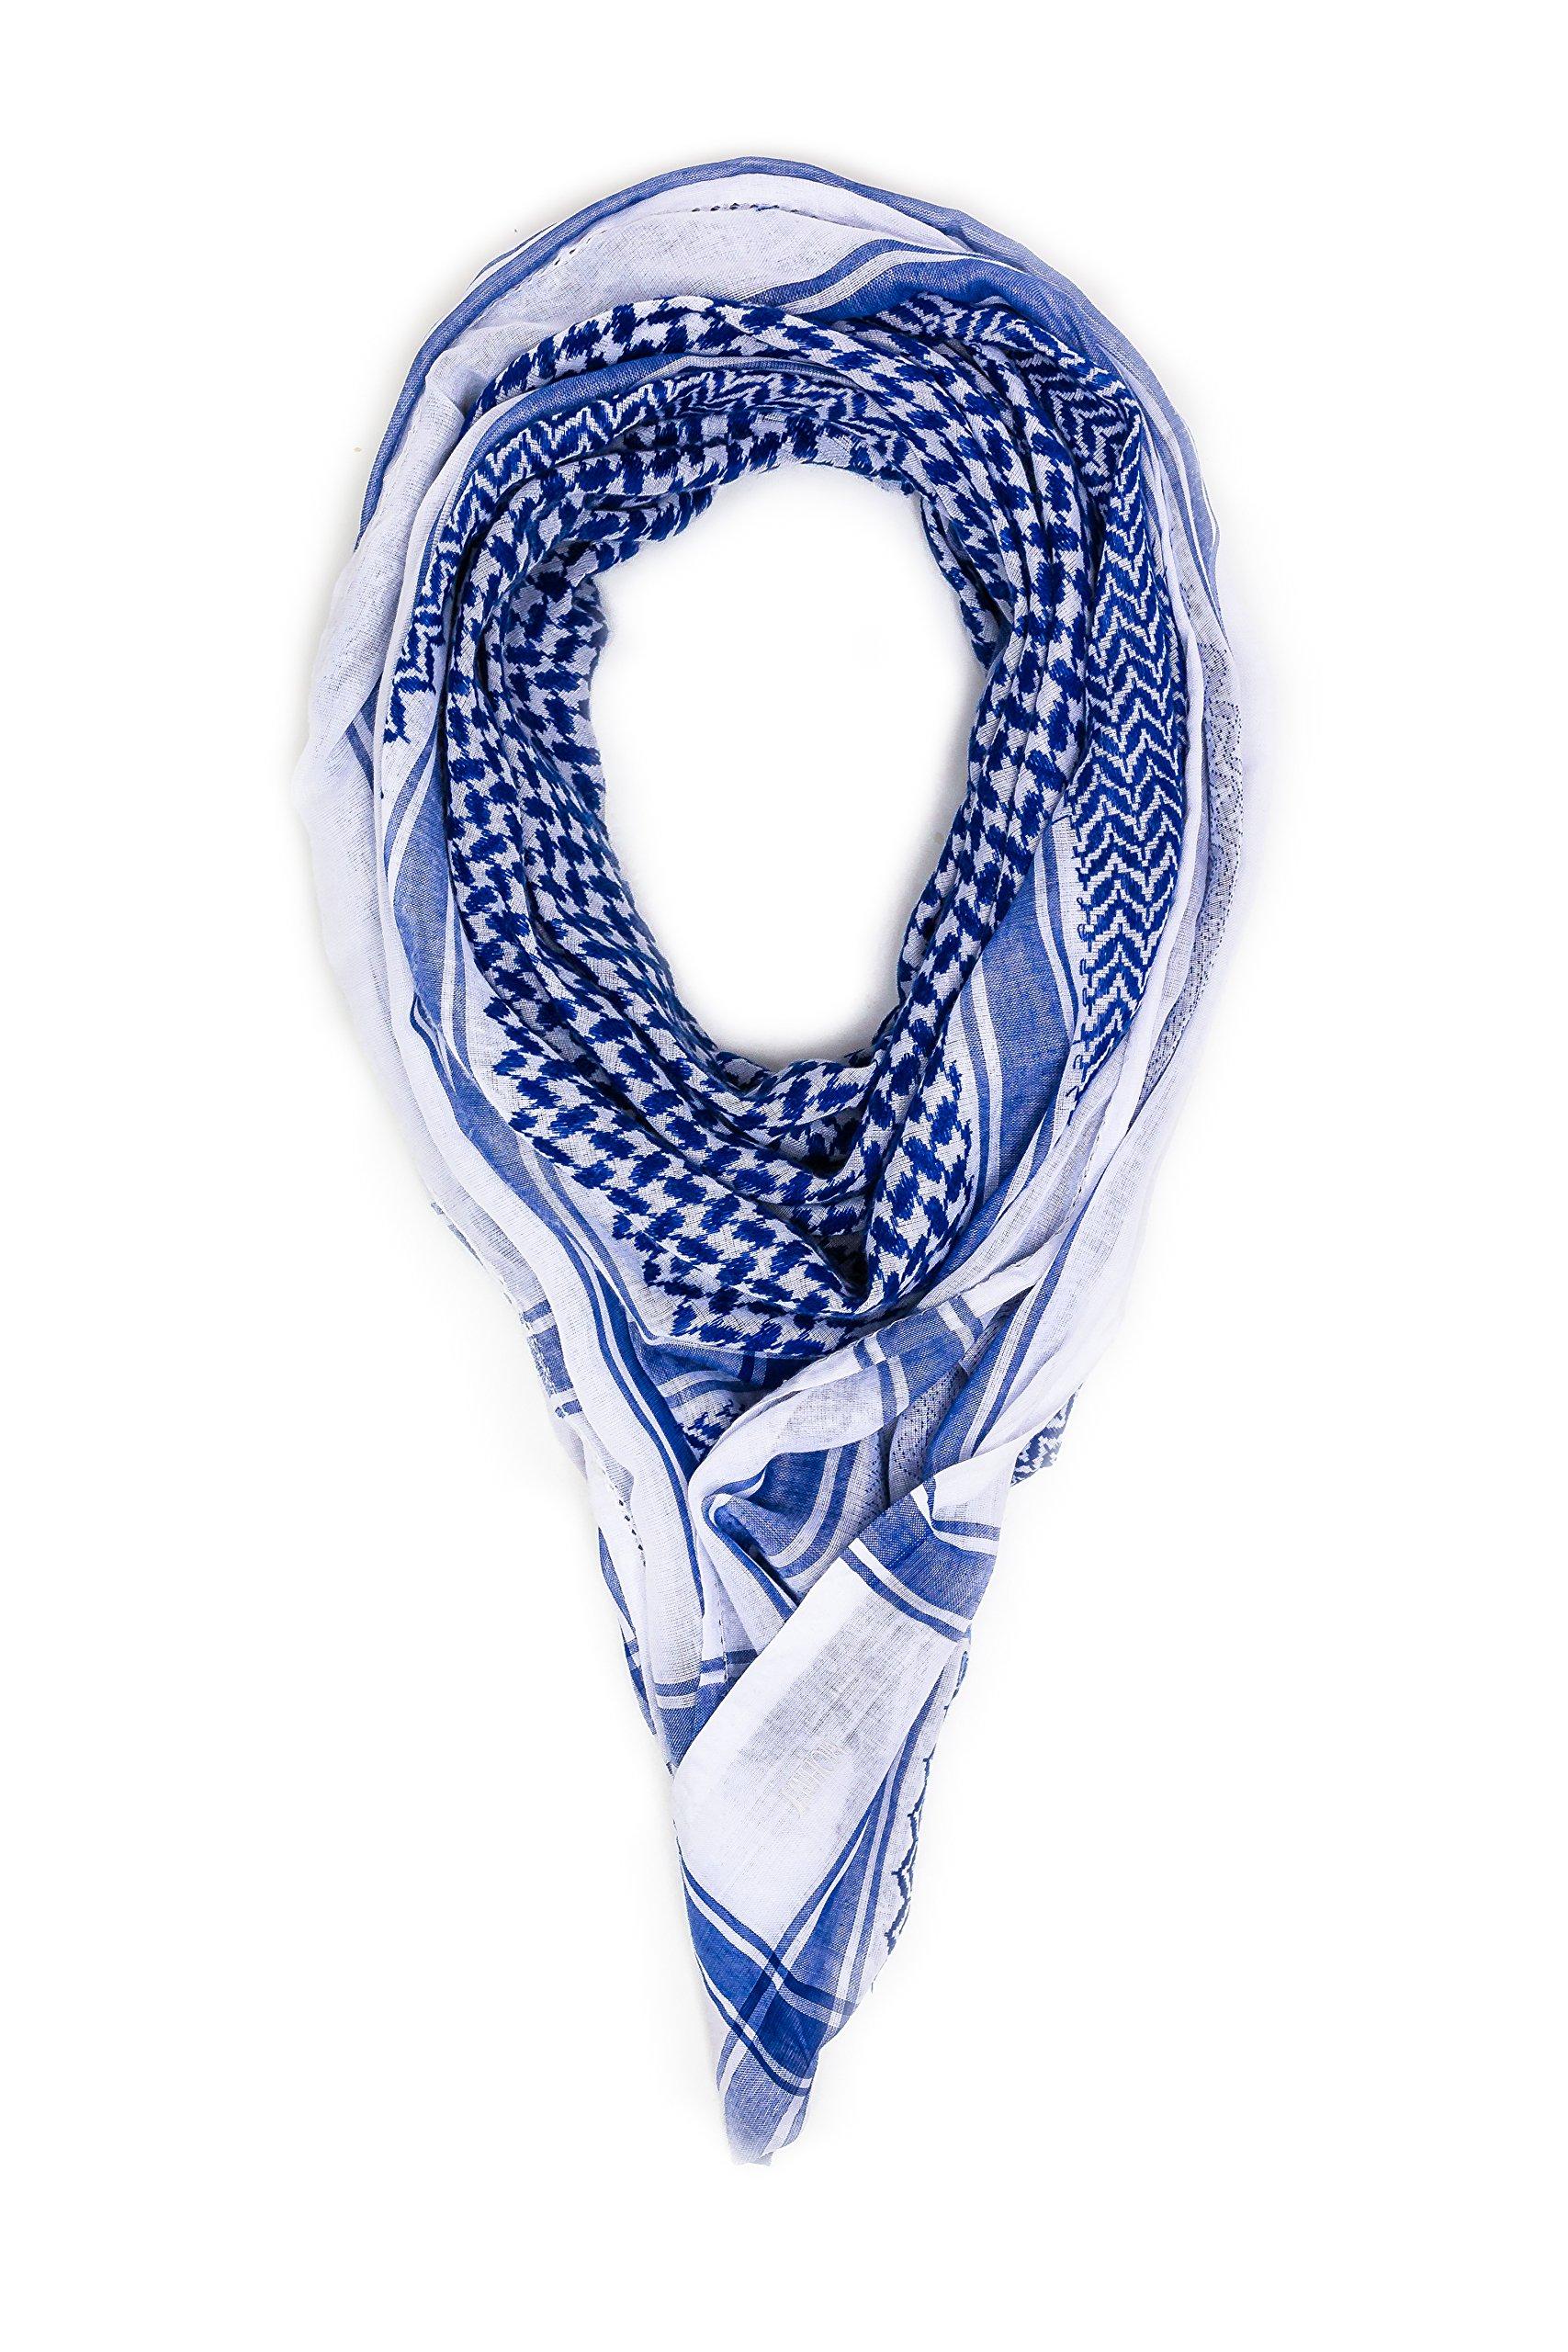 Mohavy Blue Unisex Premium Shemagh Keffiyeh | Men Women Head Scarf | Oversized Scarves